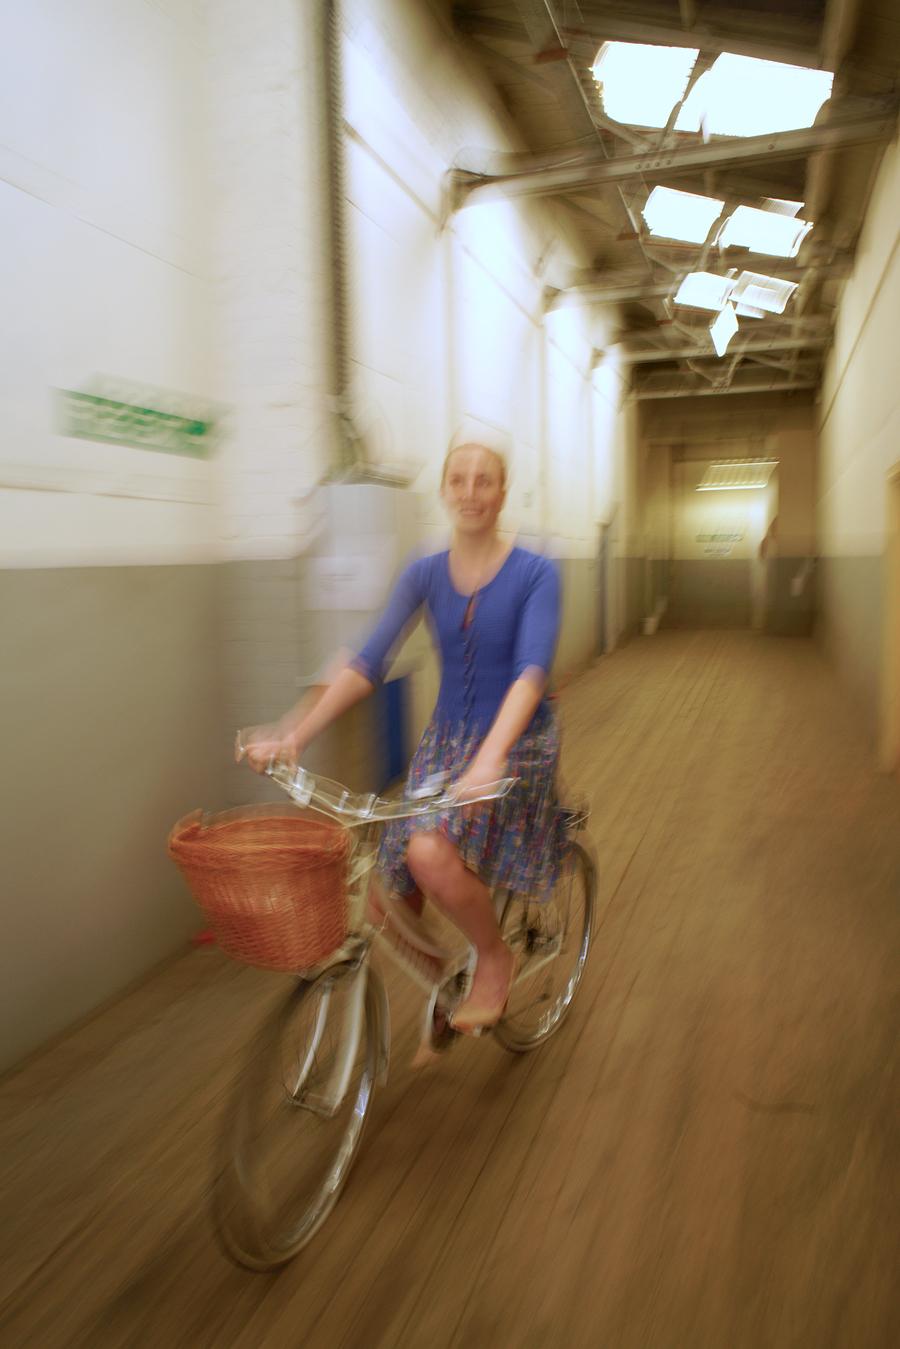 Ghost Rider / Photography by JohnDuder, Model Joceline Brooke-Hamilton, Taken at SS Creative Photography / Uploaded 8th April 2016 @ 05:32 PM